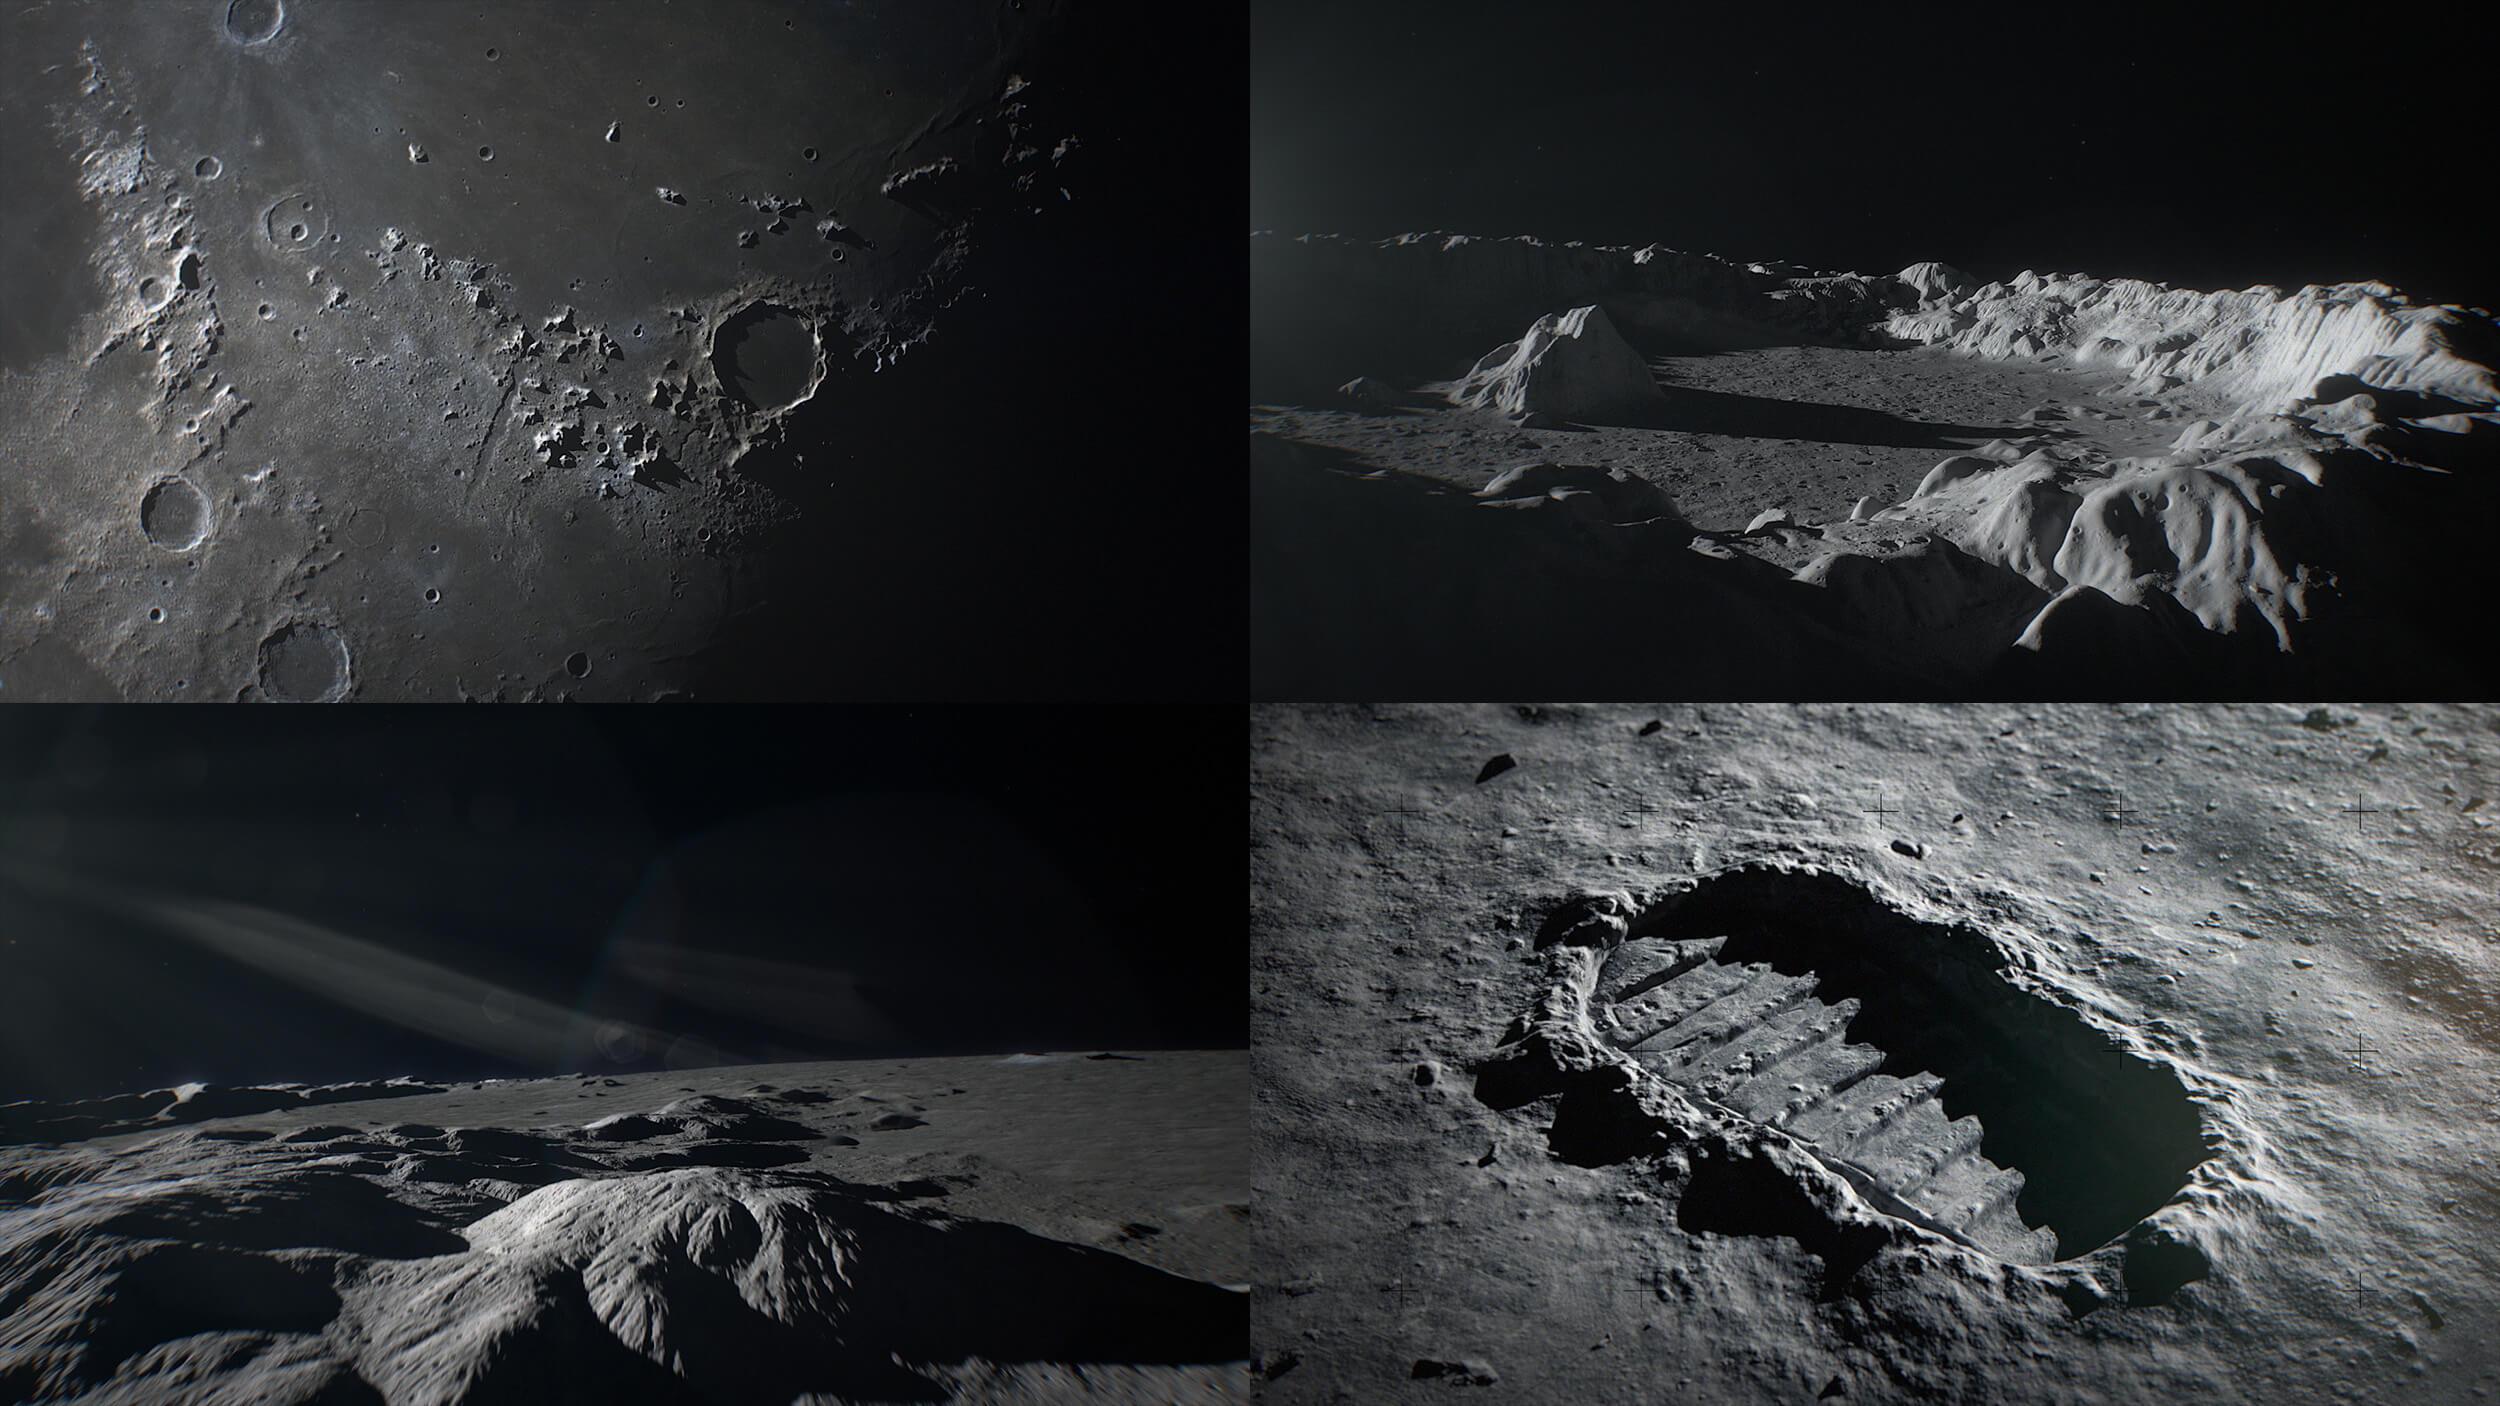 lunar-003_20170711185405.jpg